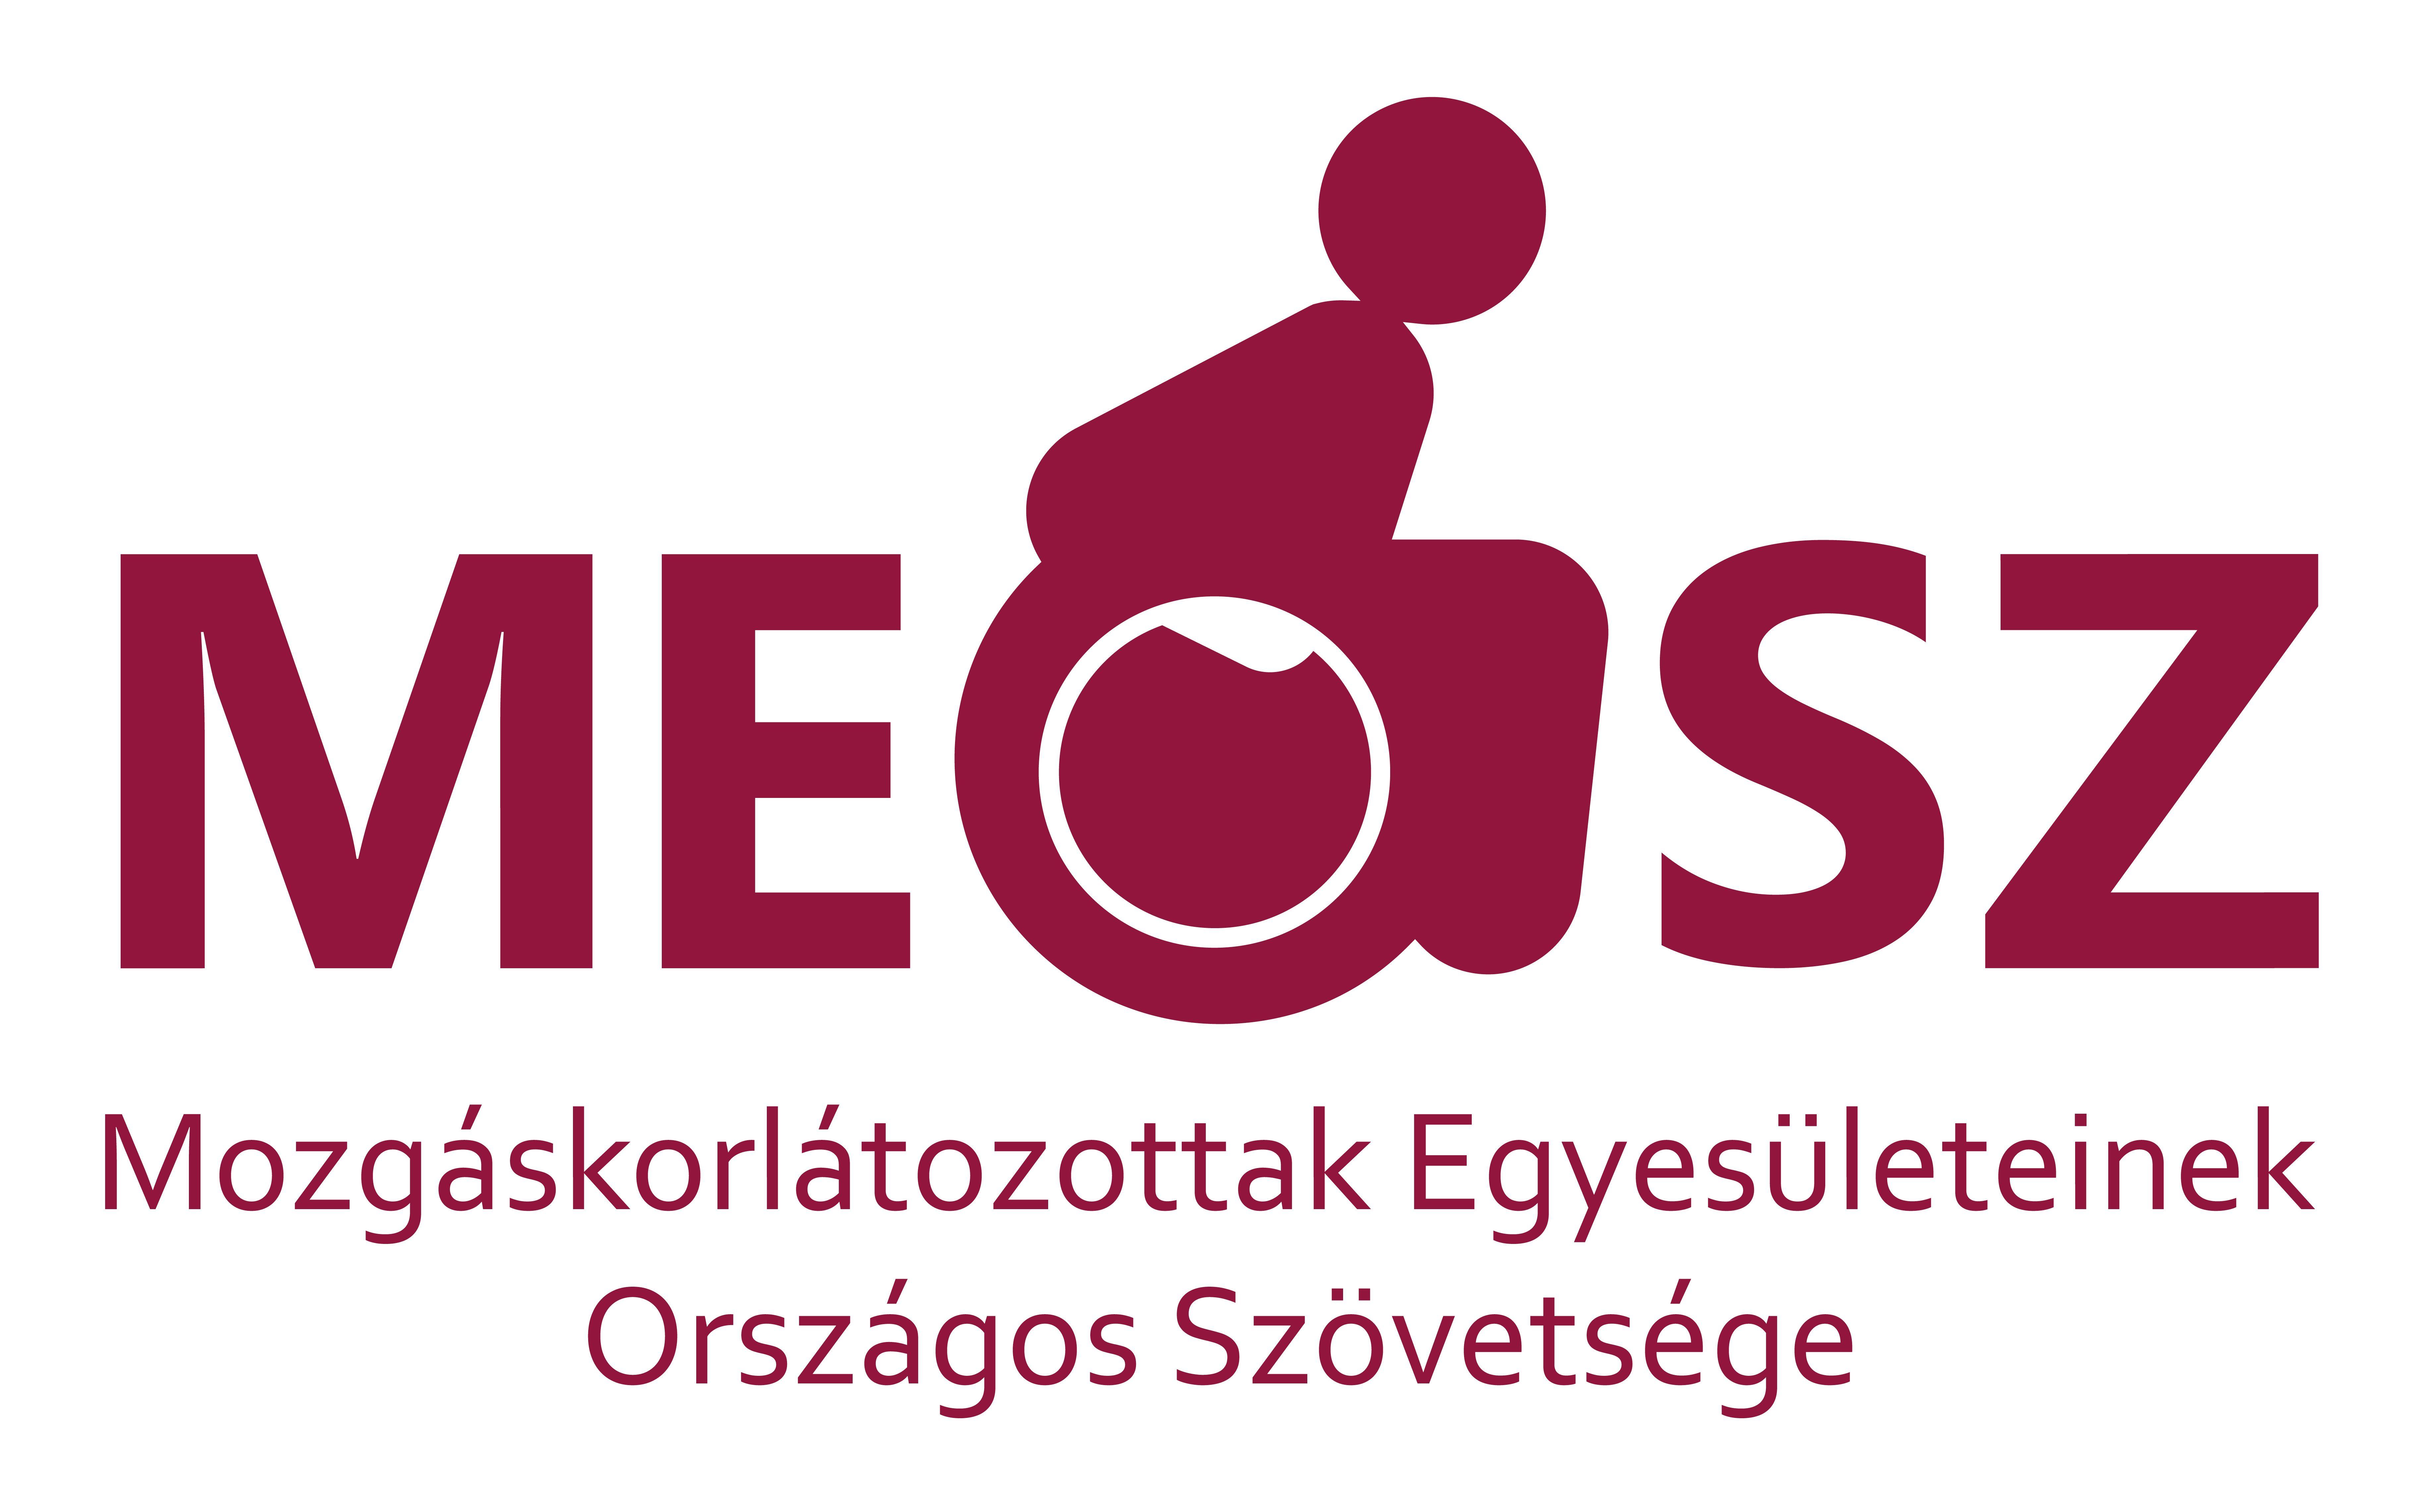 MEOSZ logo_vegleges